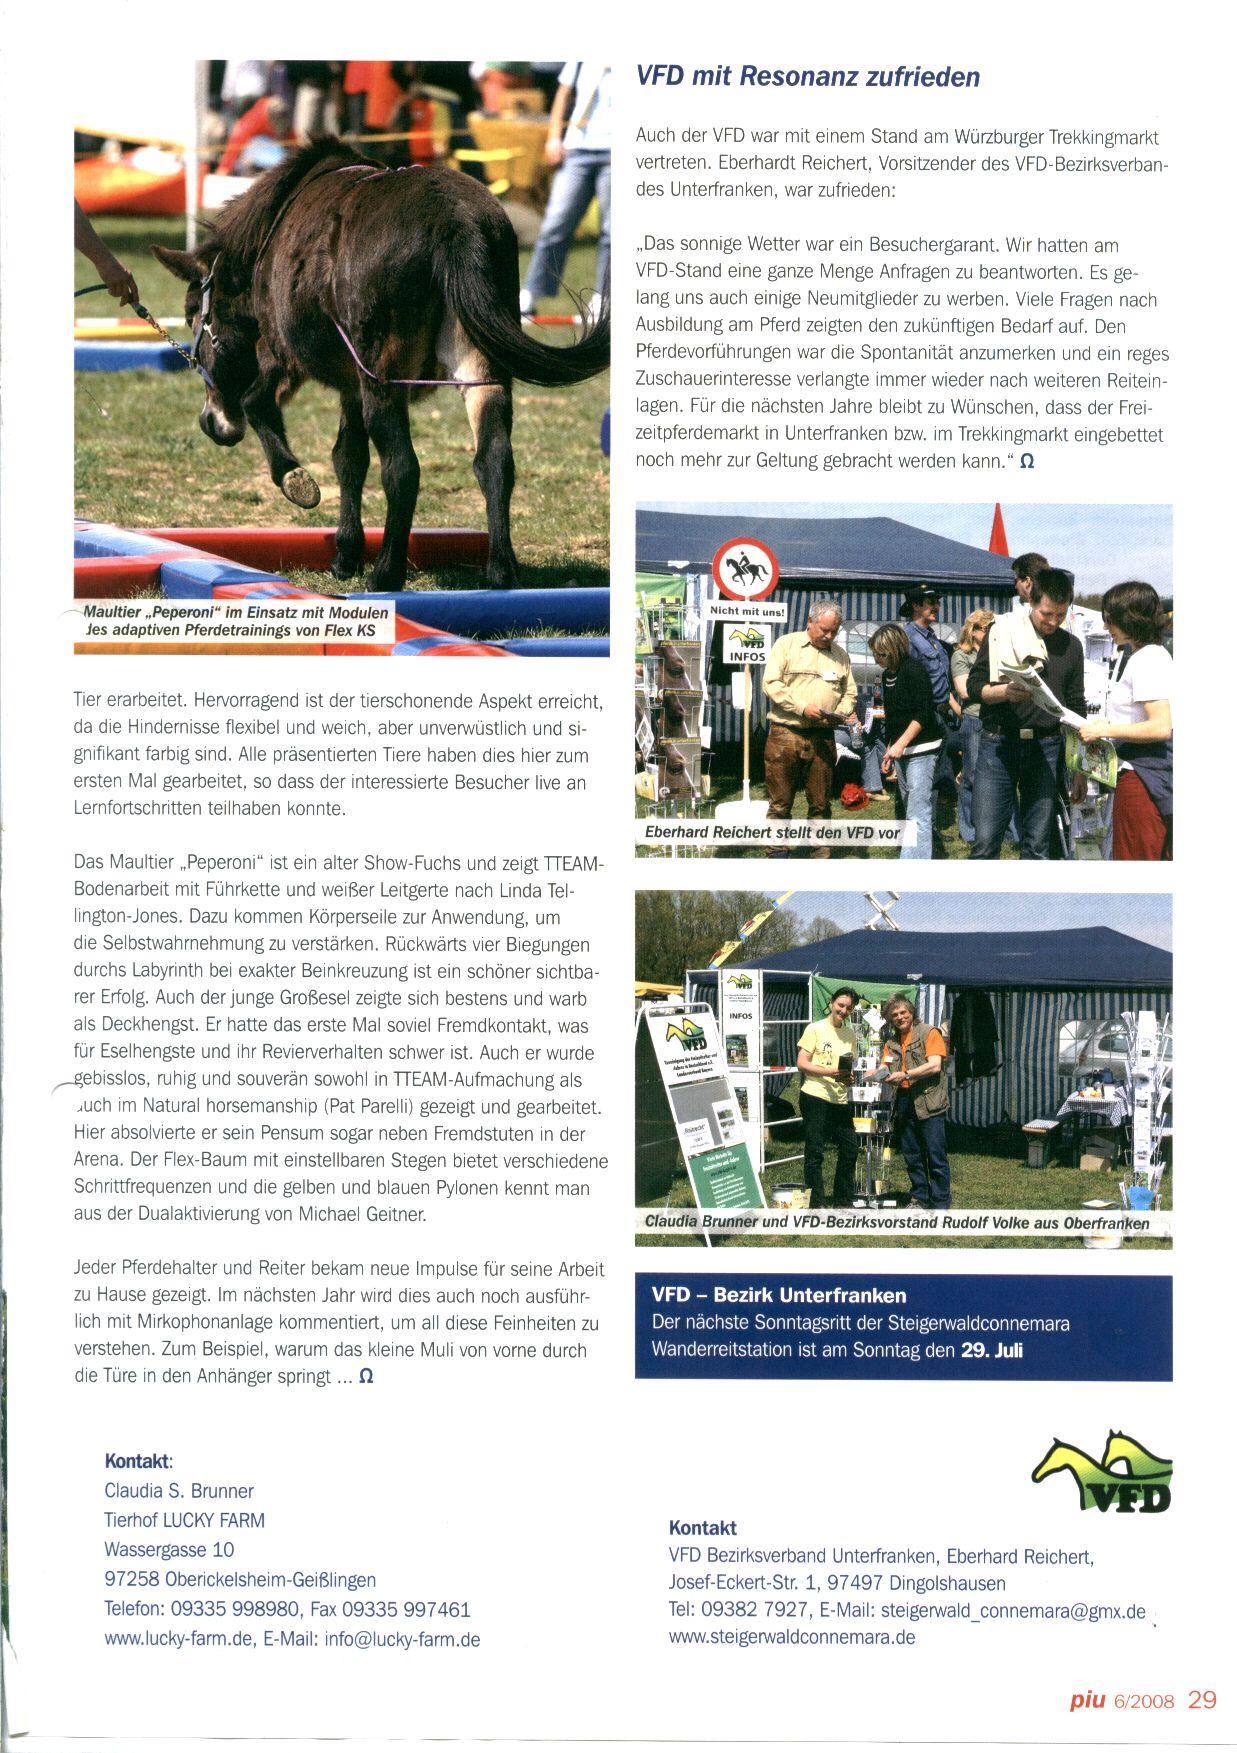 Tierhof LUCKY FARM - Presse